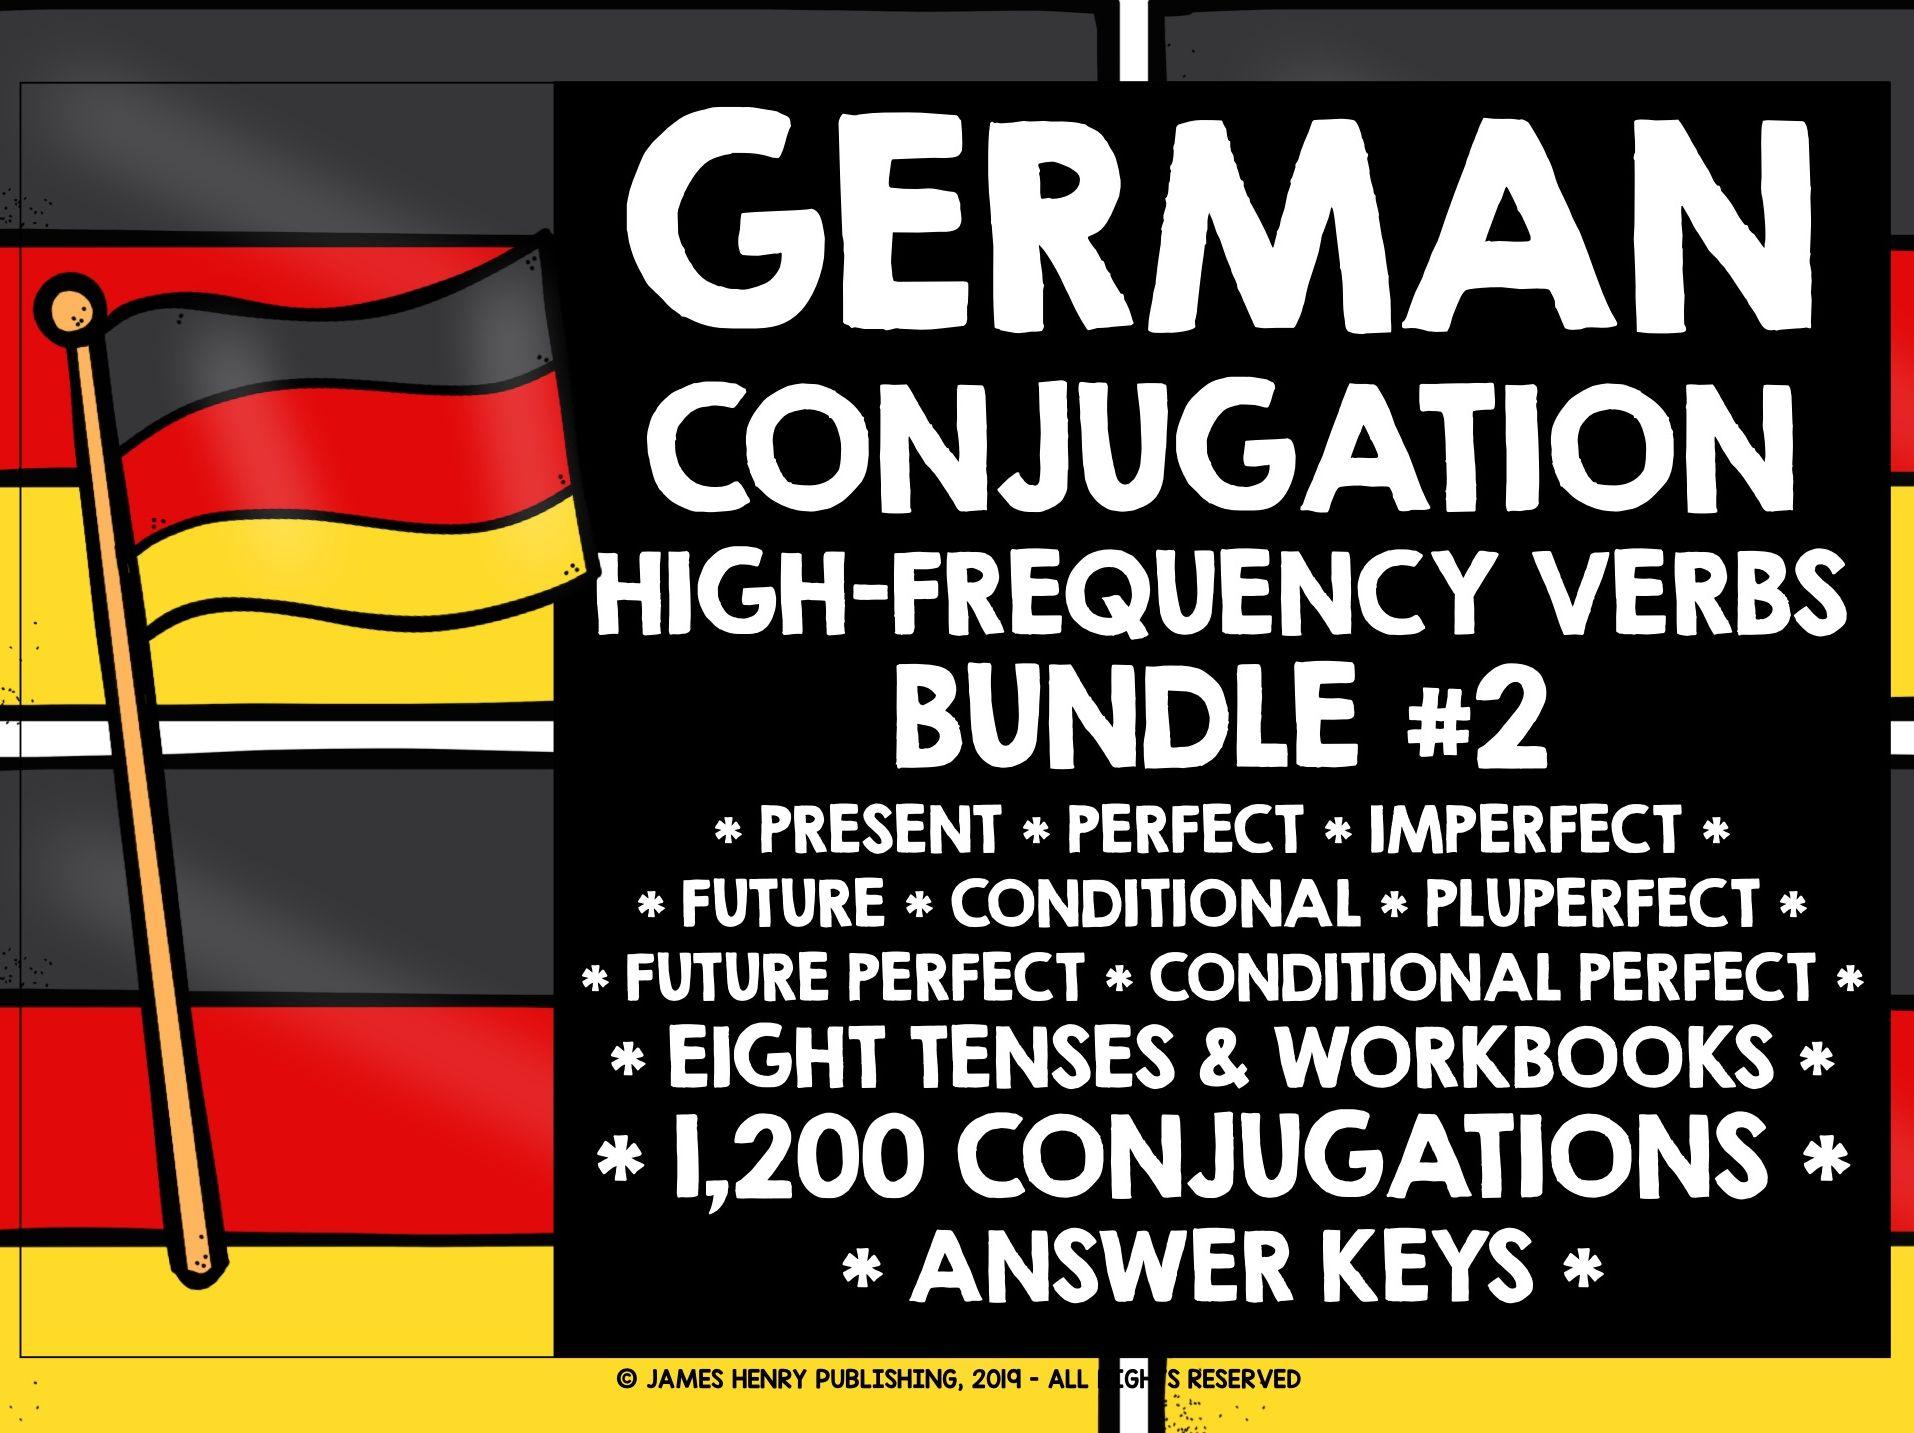 GERMAN HIGH-FREQUENCY VERBS CONJUGATION BUNDLE 2